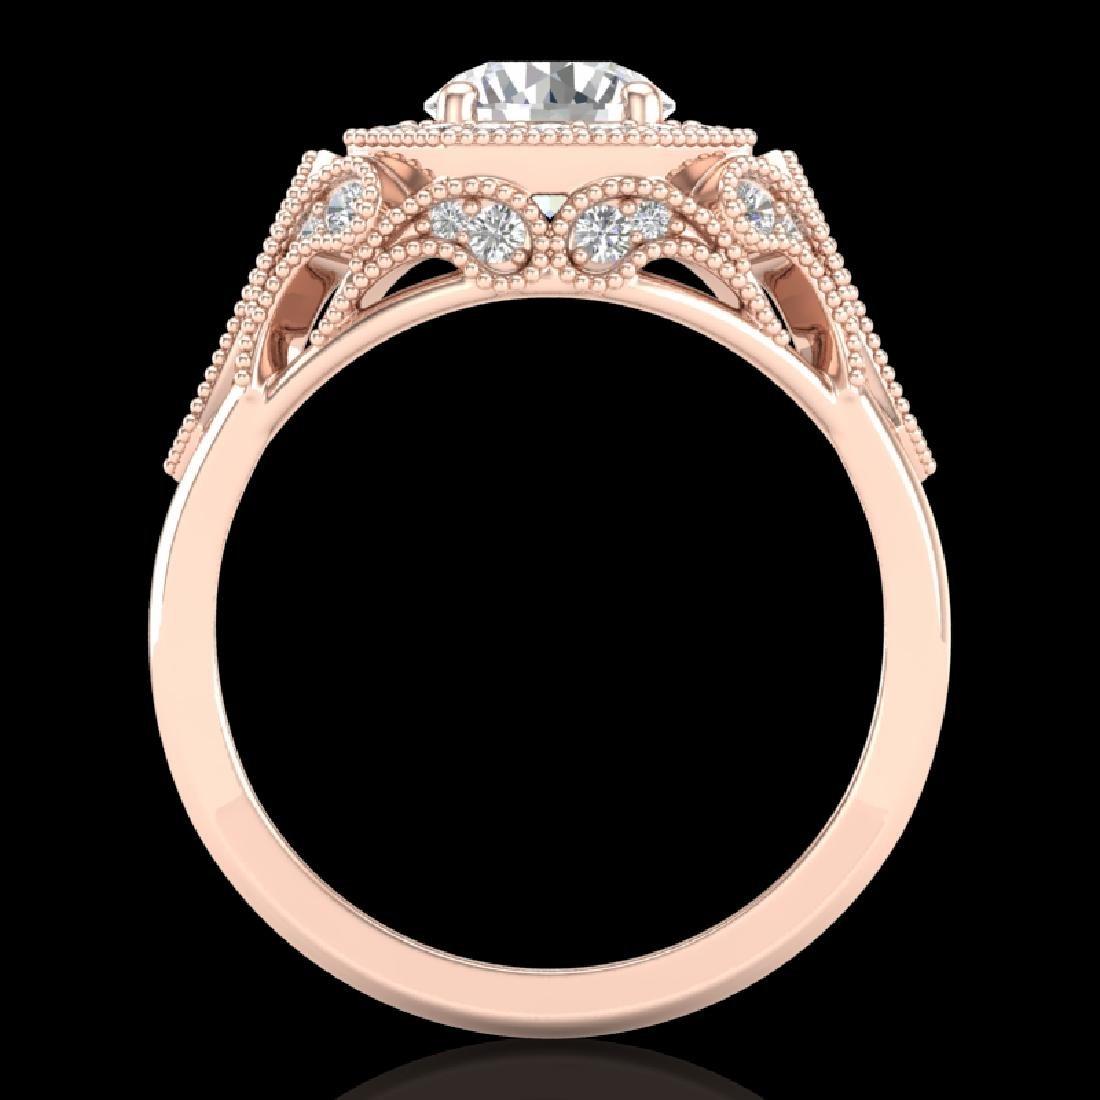 1.75 CTW VS/SI Diamond Solitaire Art Deco Ring 18K Rose